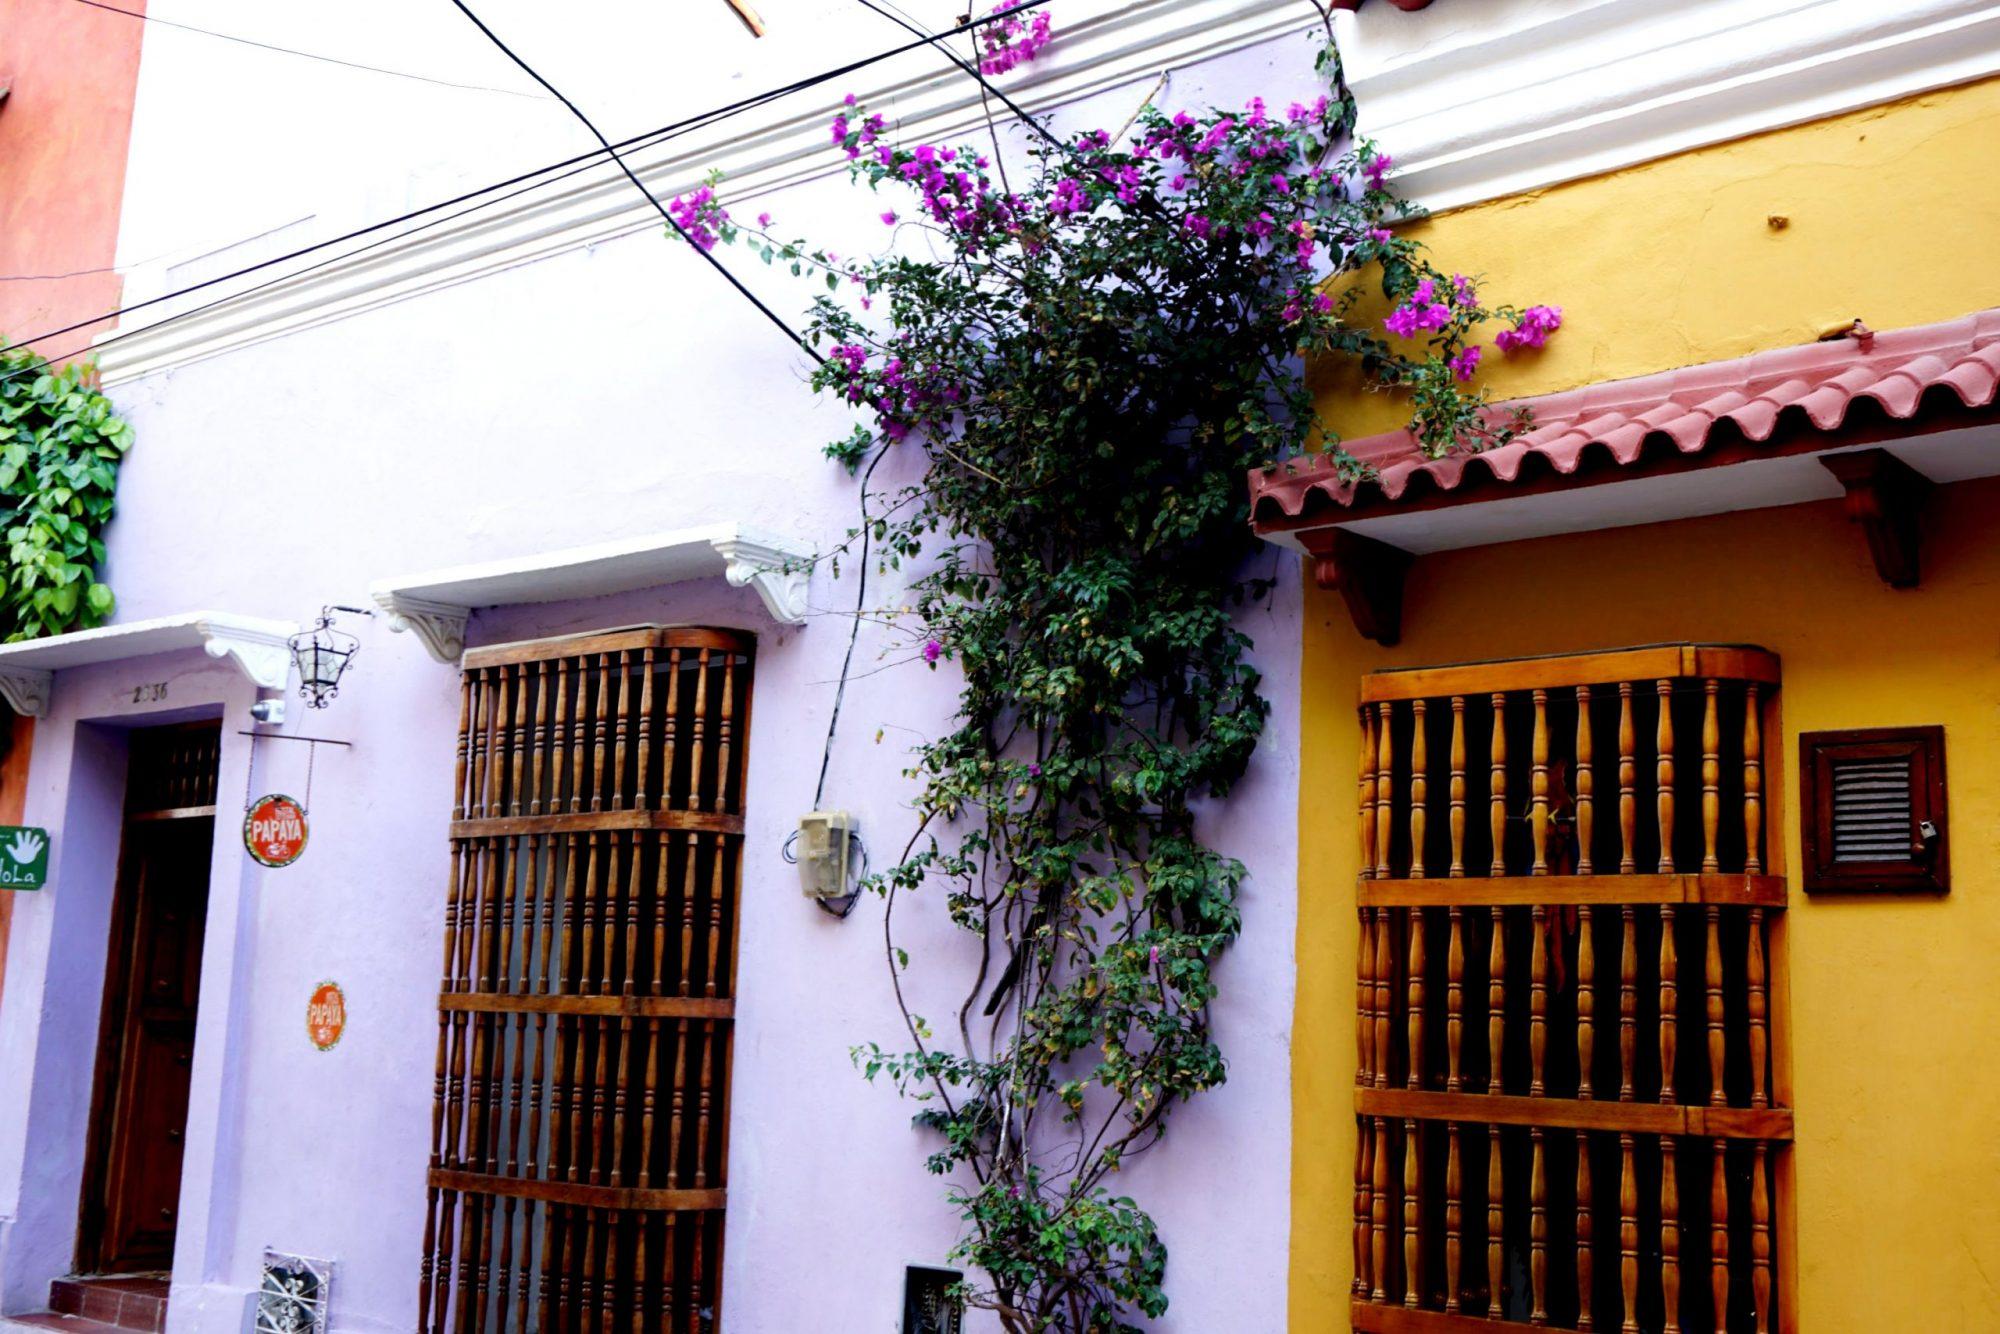 Getsemaní Cartagena Flowers